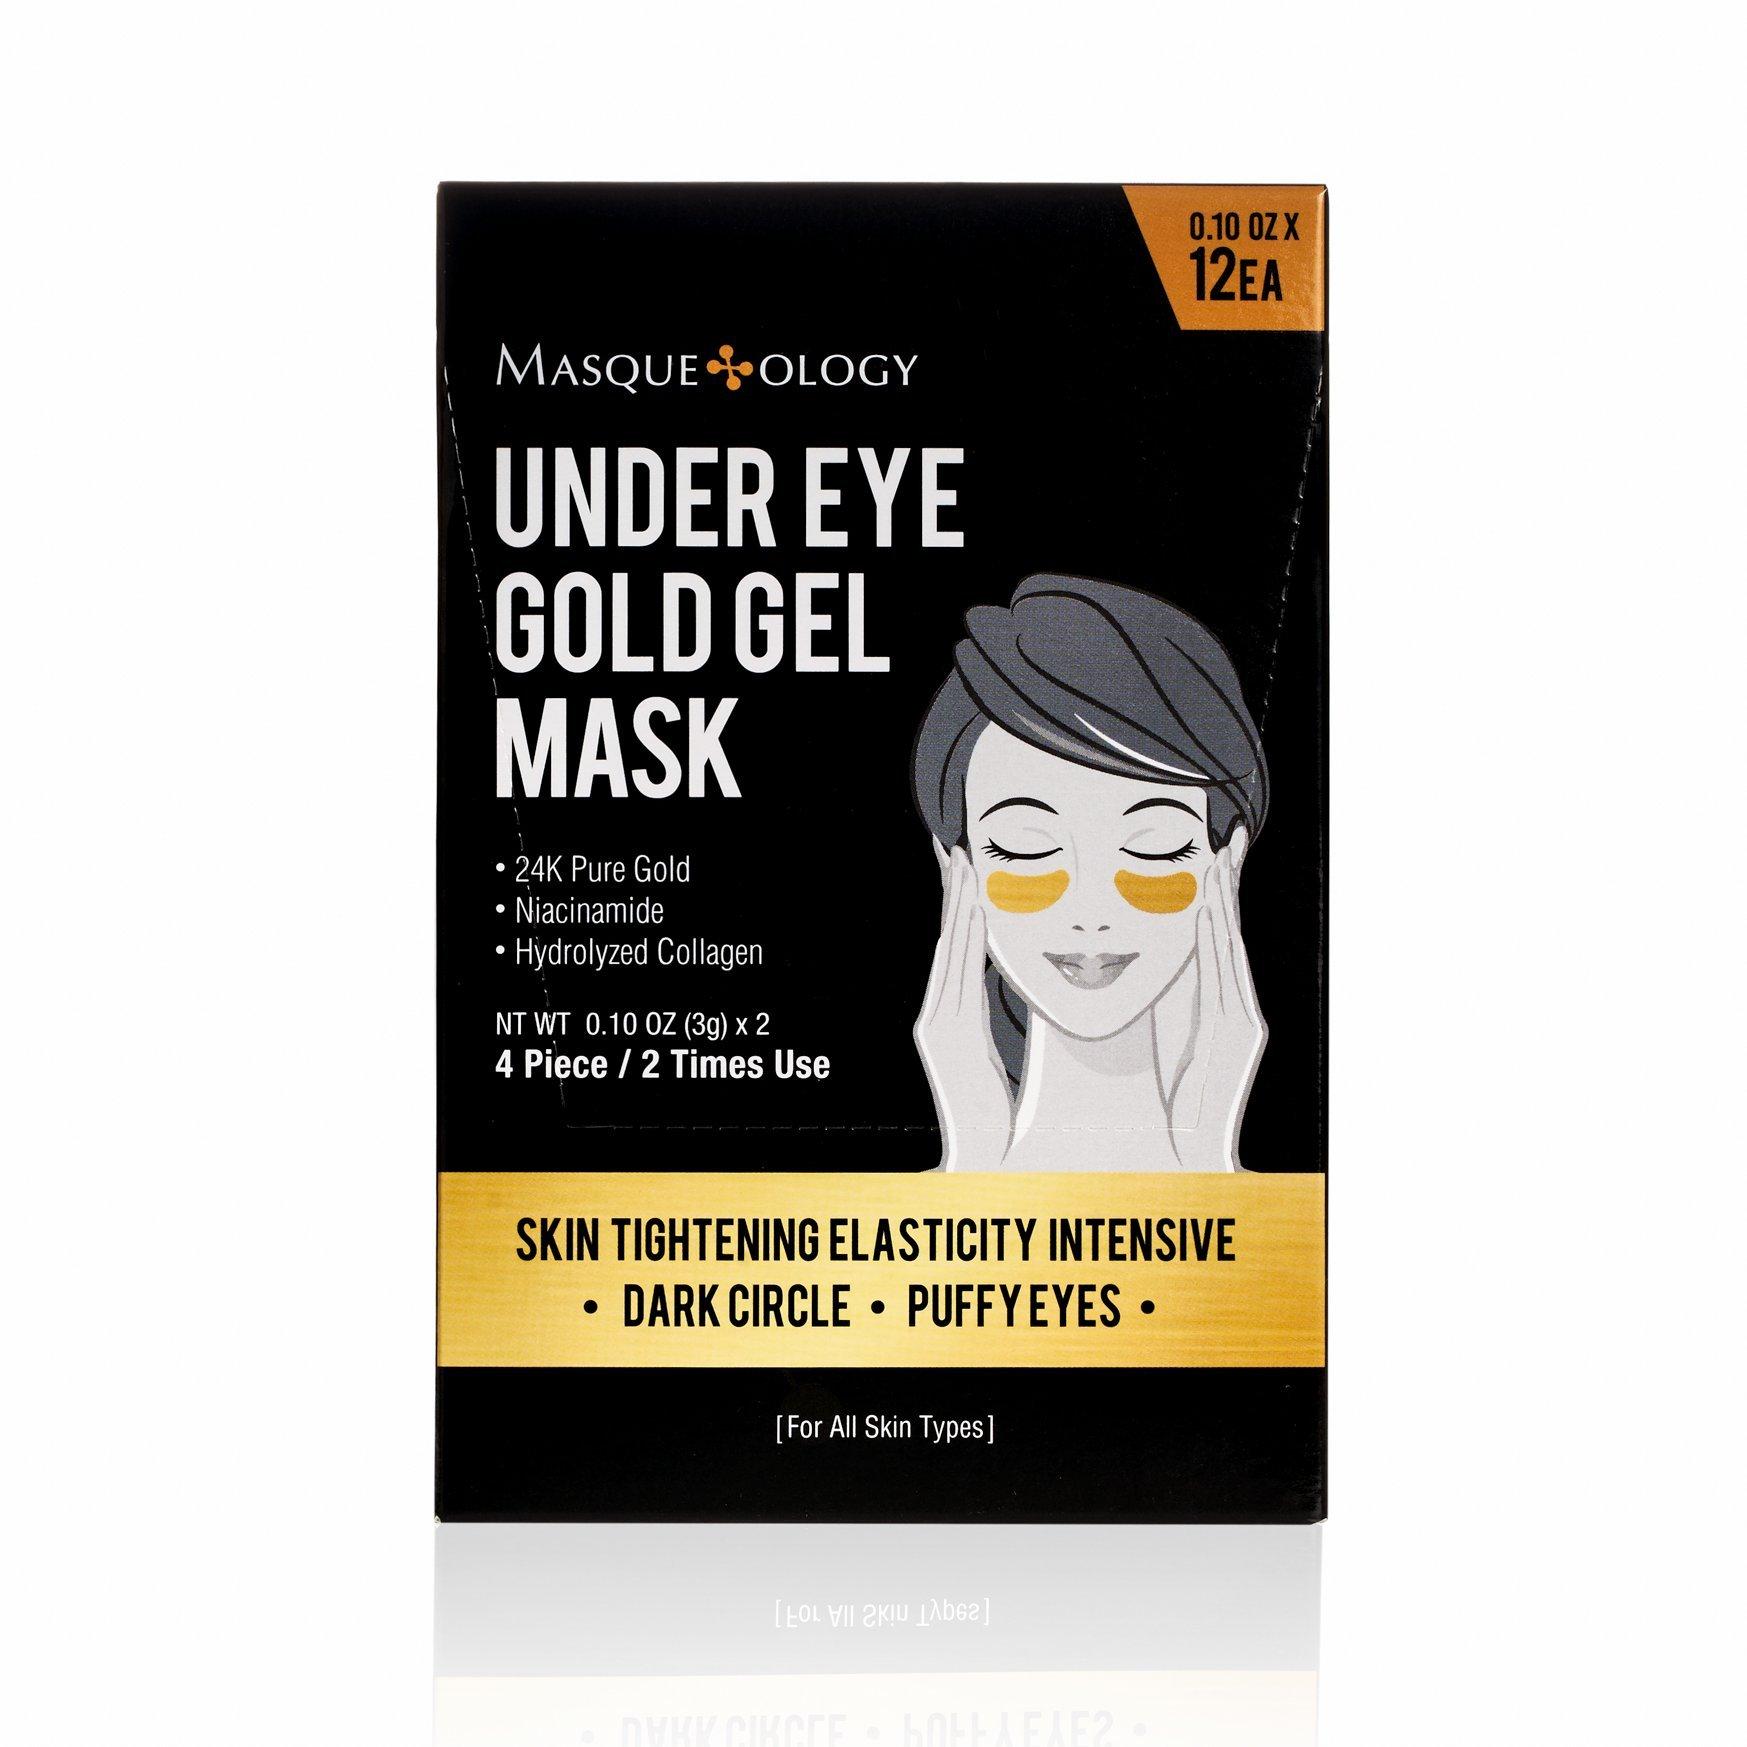 Masqueology Under Eye Gold Gel Mask, 12 ct.